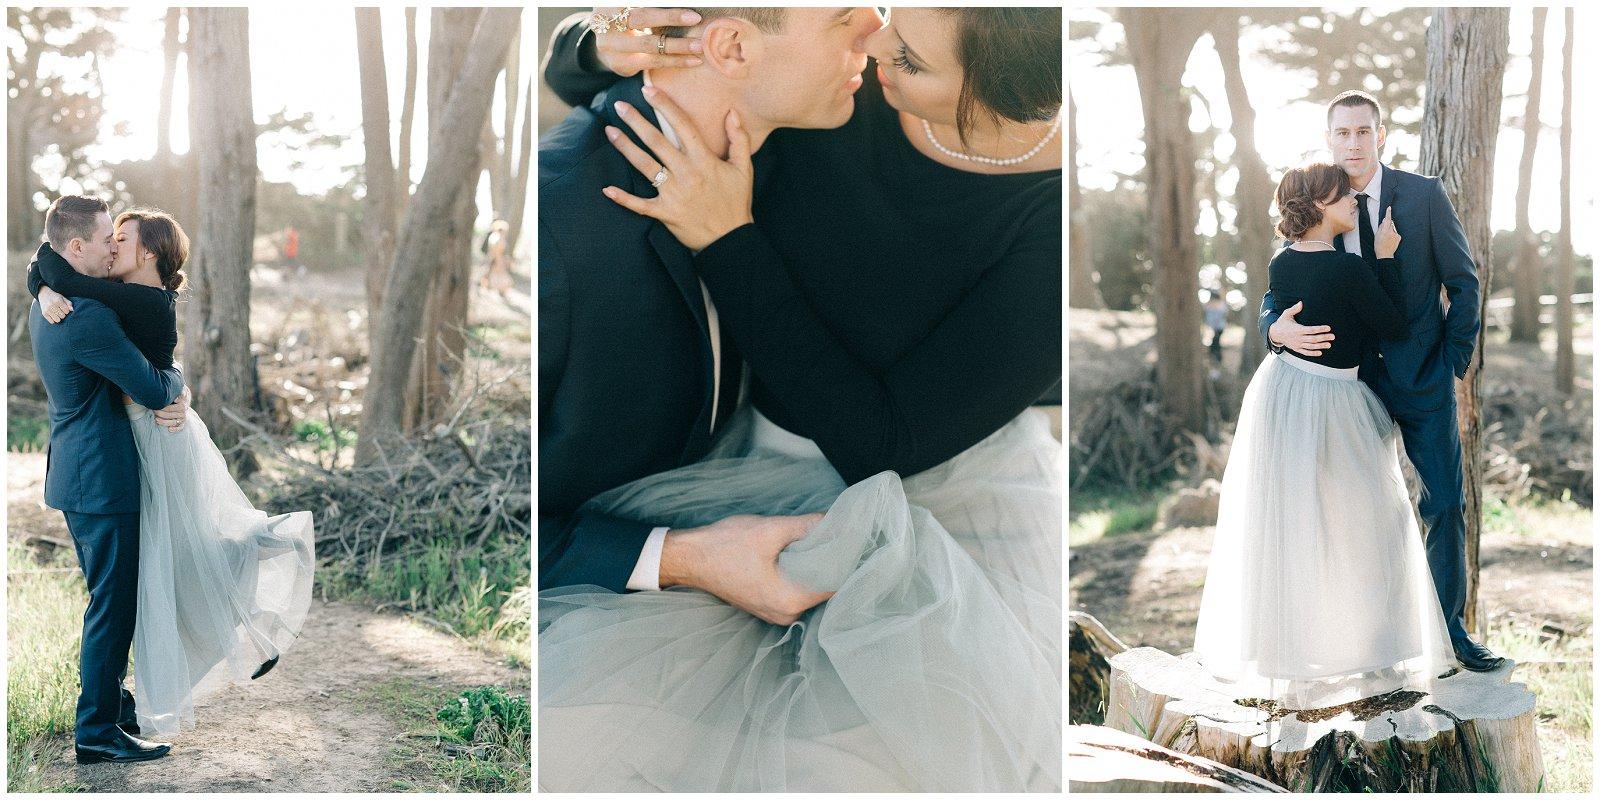 San-Francisco-Bay-Area-Wedding-Photography-Engagment-Session-7.jpg